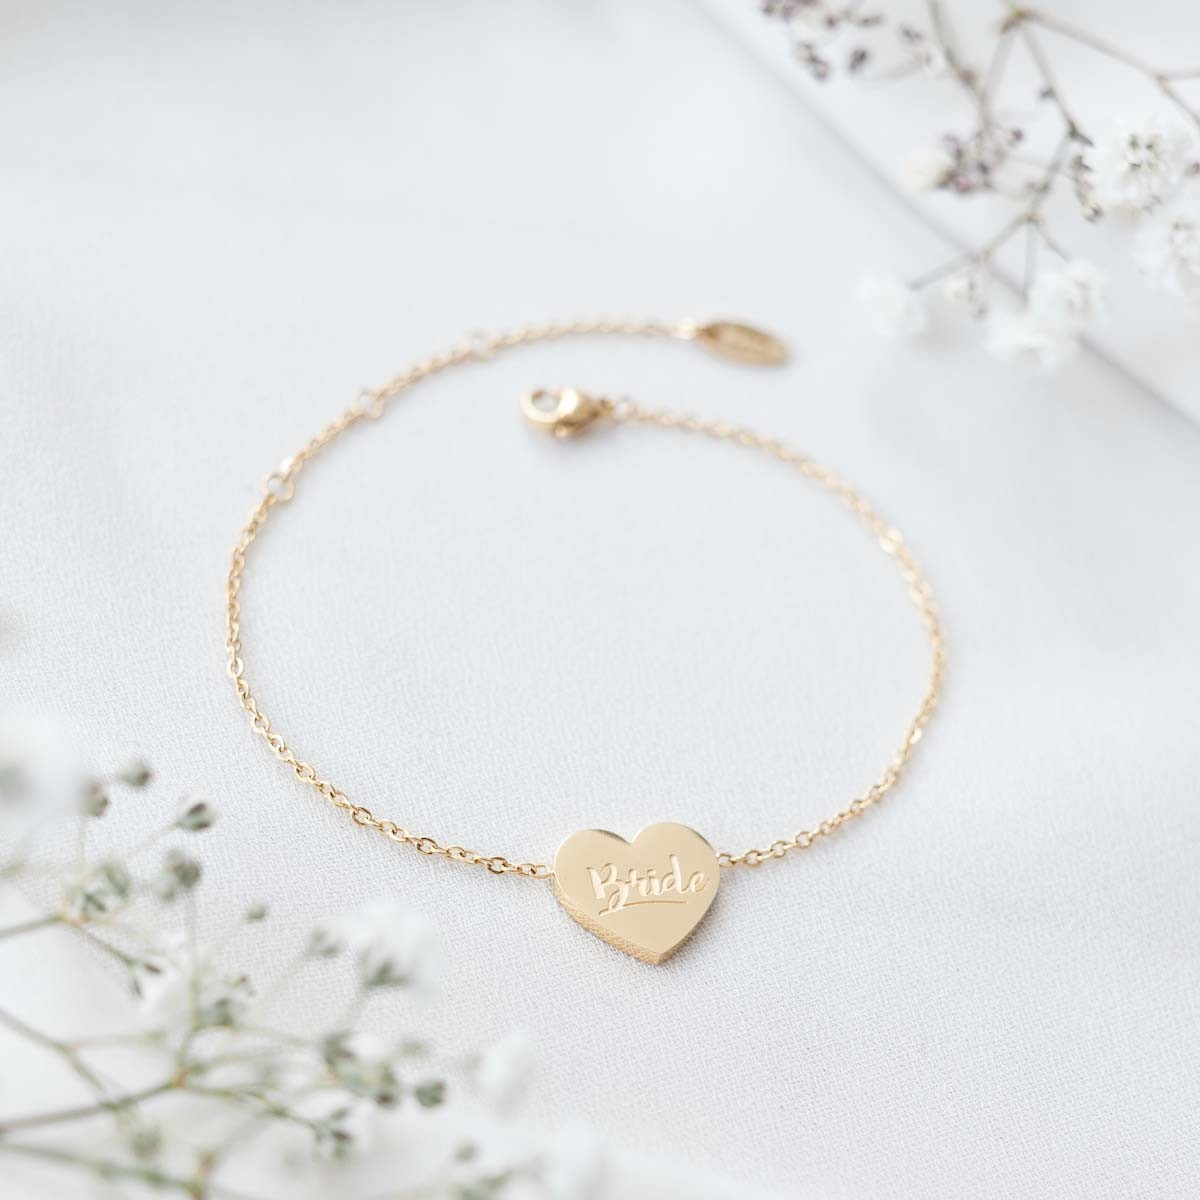 Oh Bracelet Berlin – Bride Armband II aus Edelstahl, vergoldet